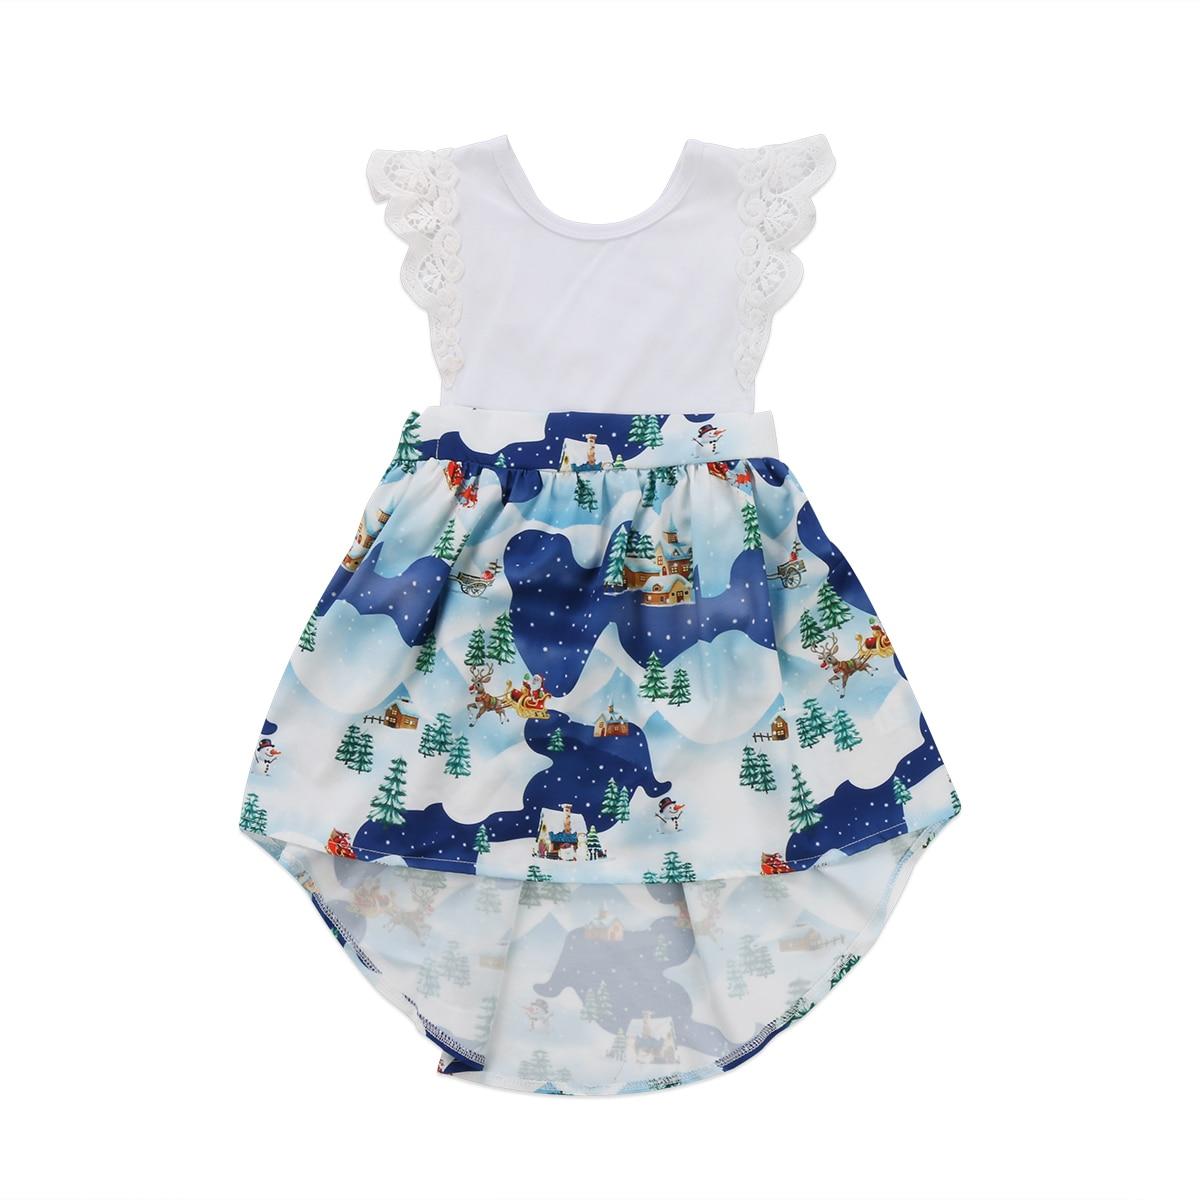 2018 Cute Christmas Newborn Baby Girl Kid Xmas Lace Sleeveless ...